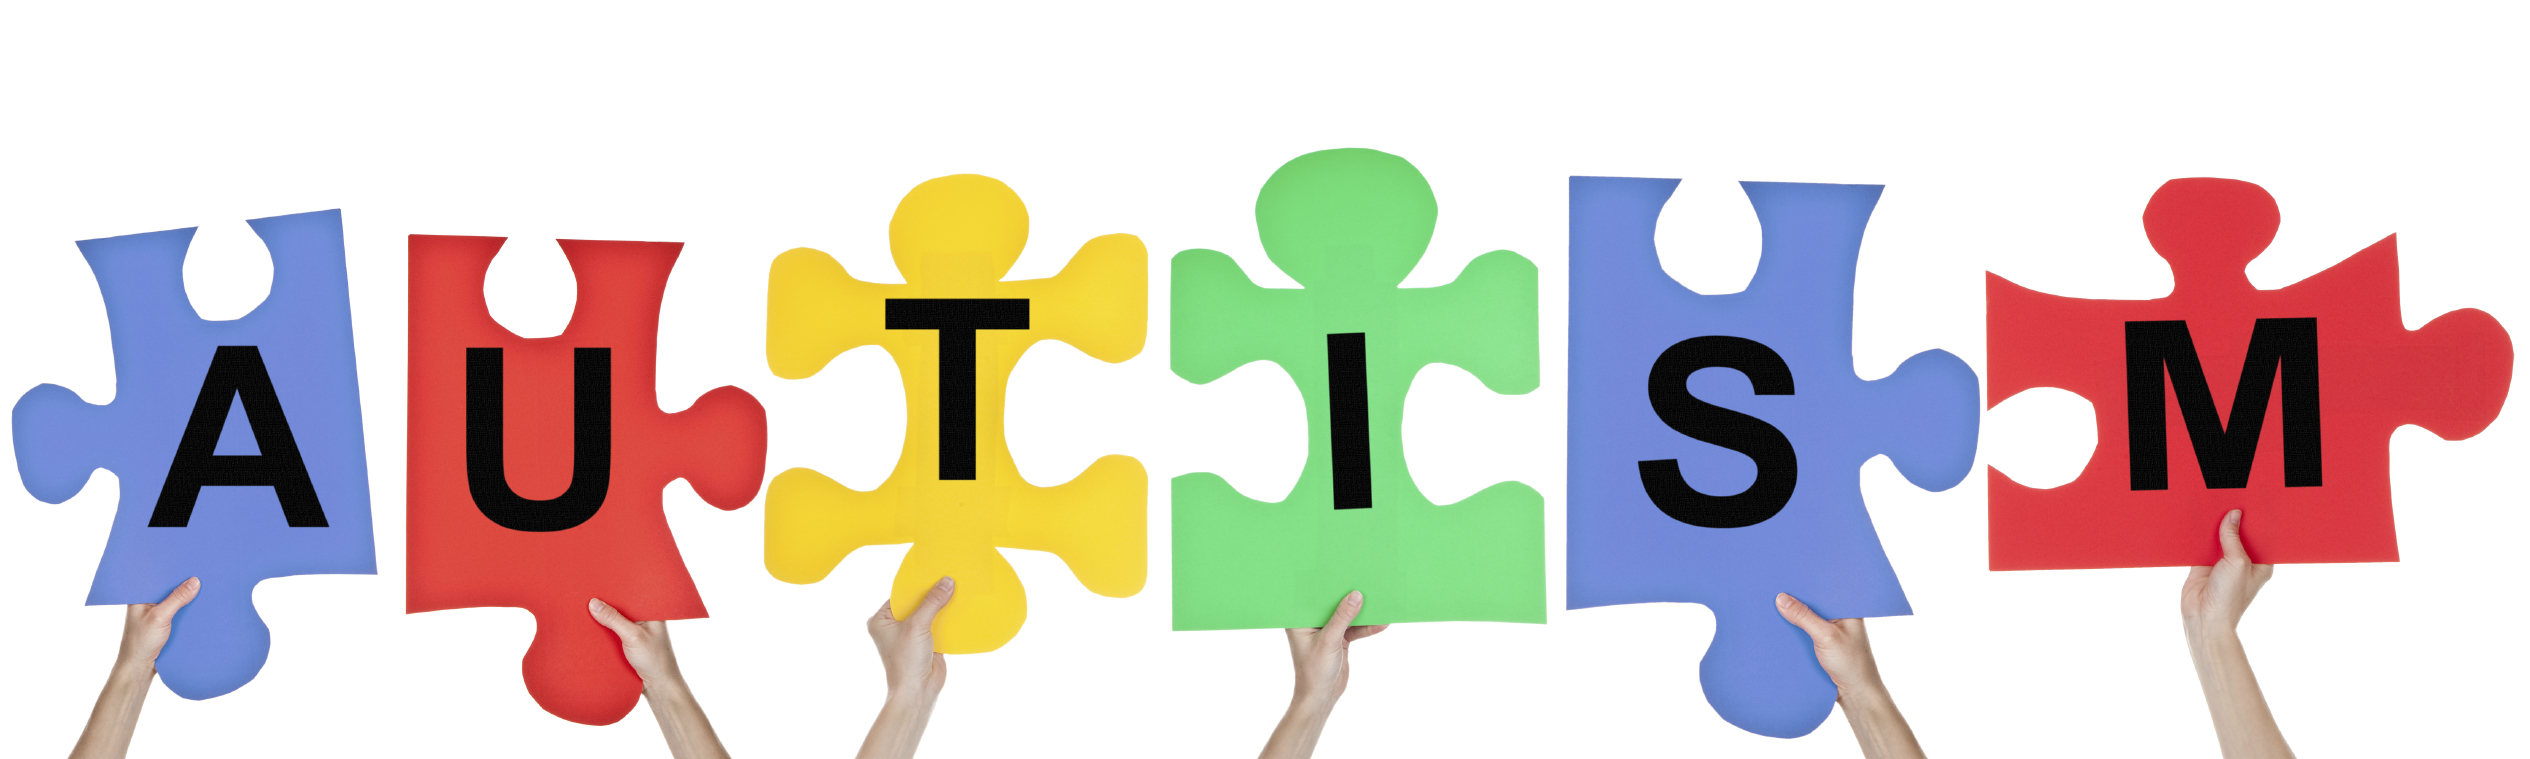 Linking mcs and john. Autism clipart autism symbol